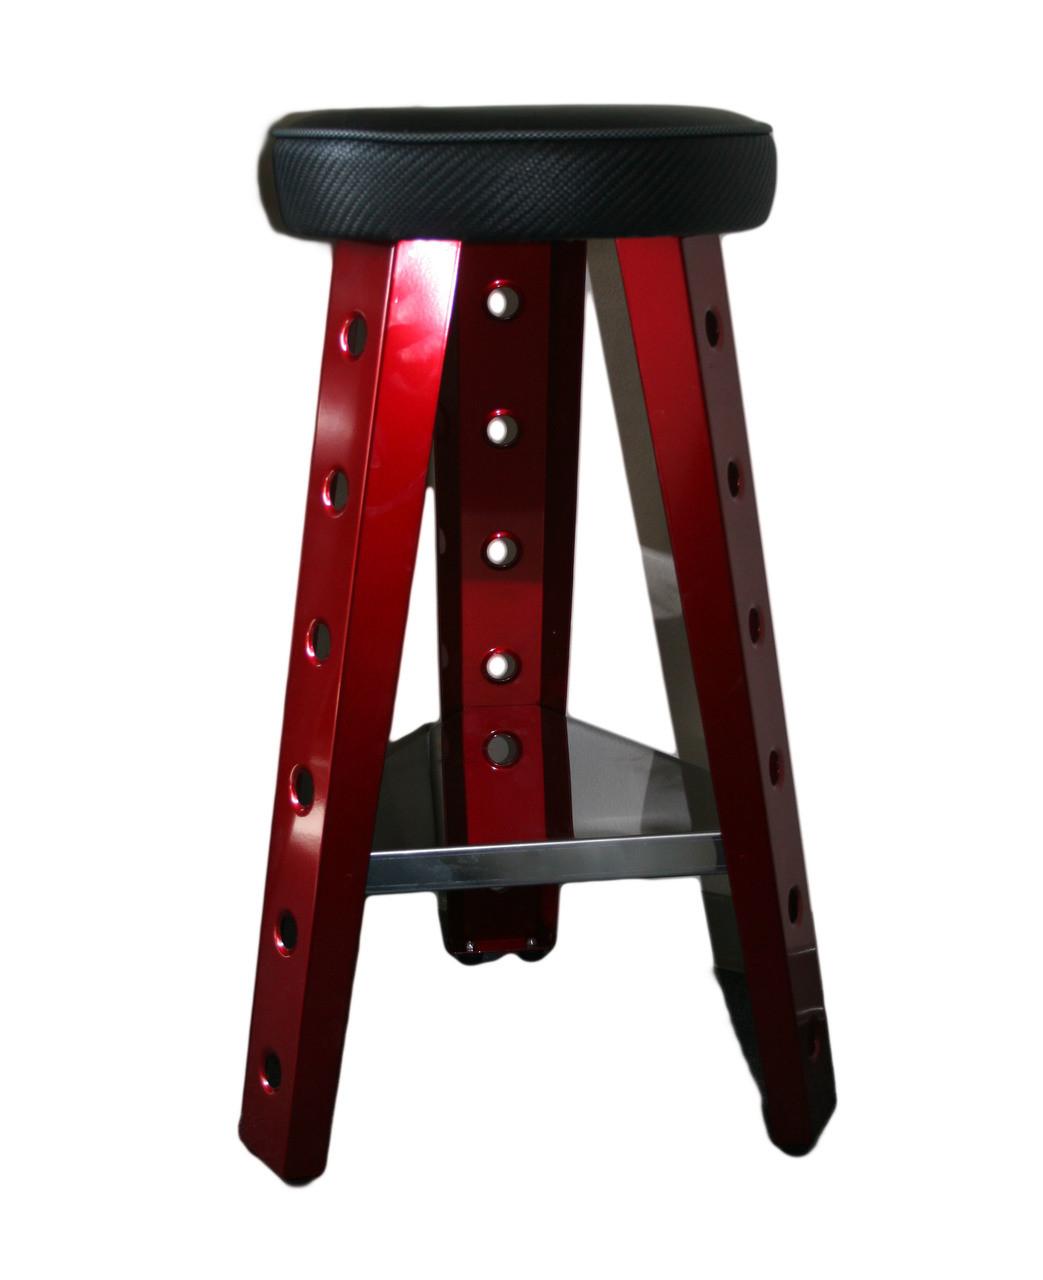 amerihome adjustable automotive of set stool dp height com amazon stools shop